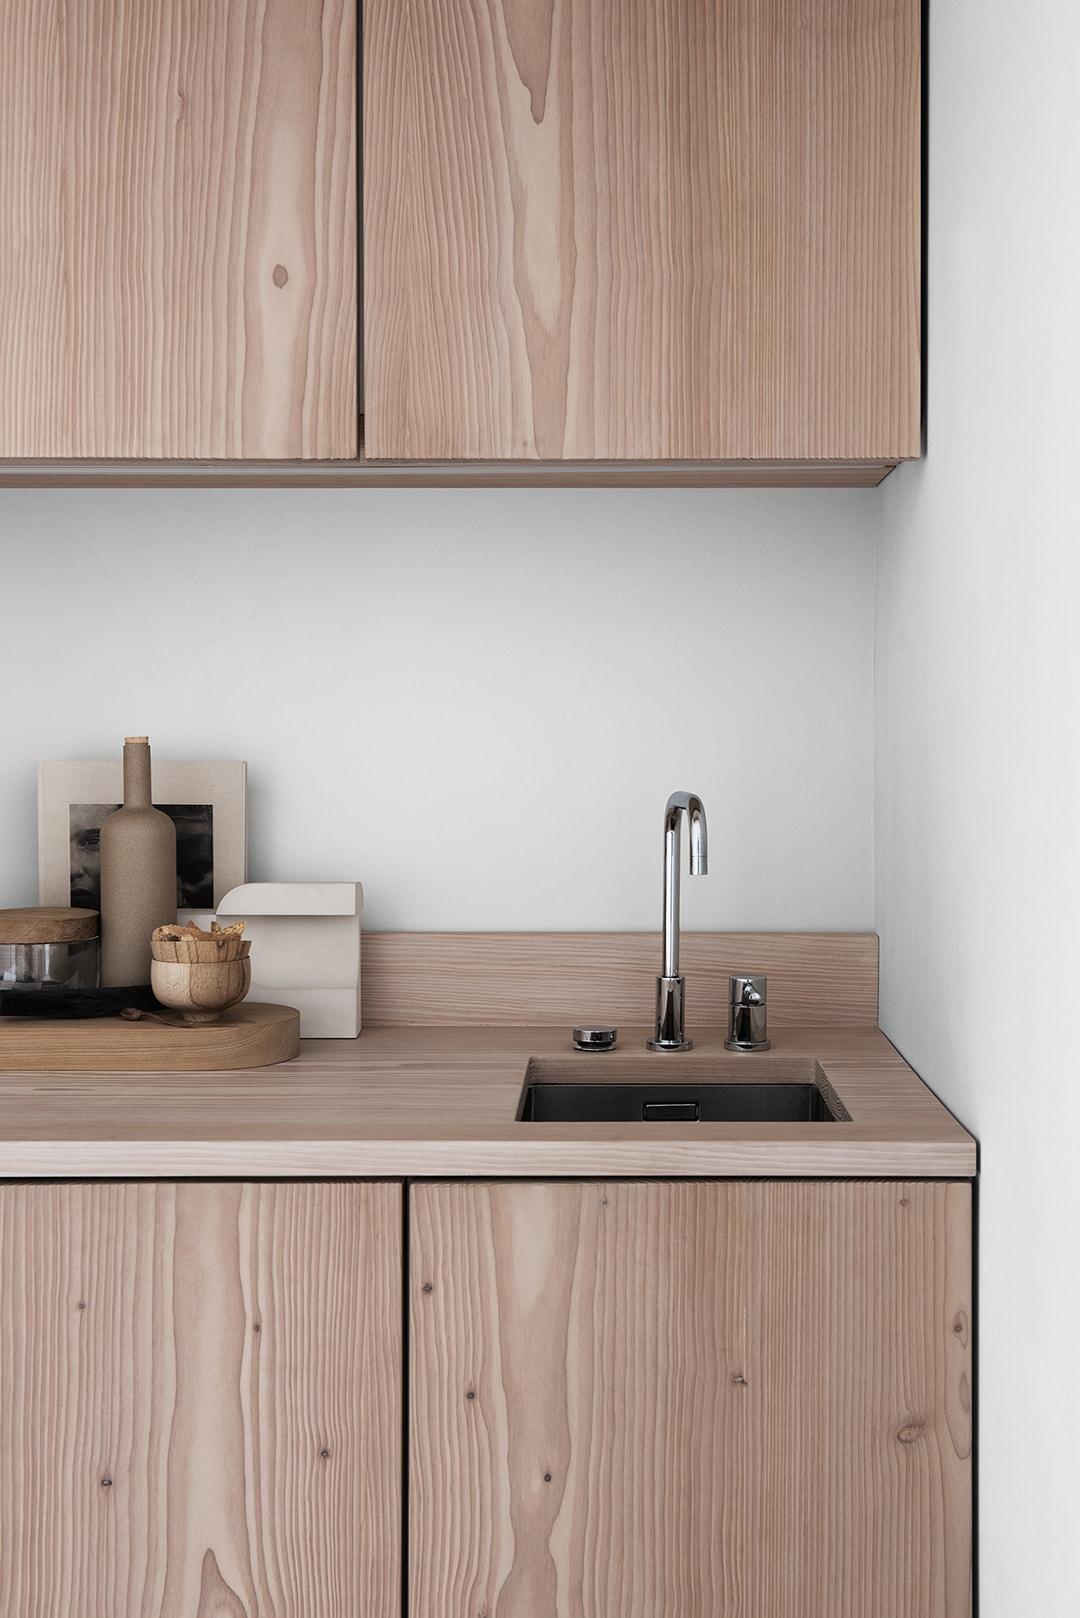 Lotta Agaton for Picky Living - via Coco Lapine Design Blog